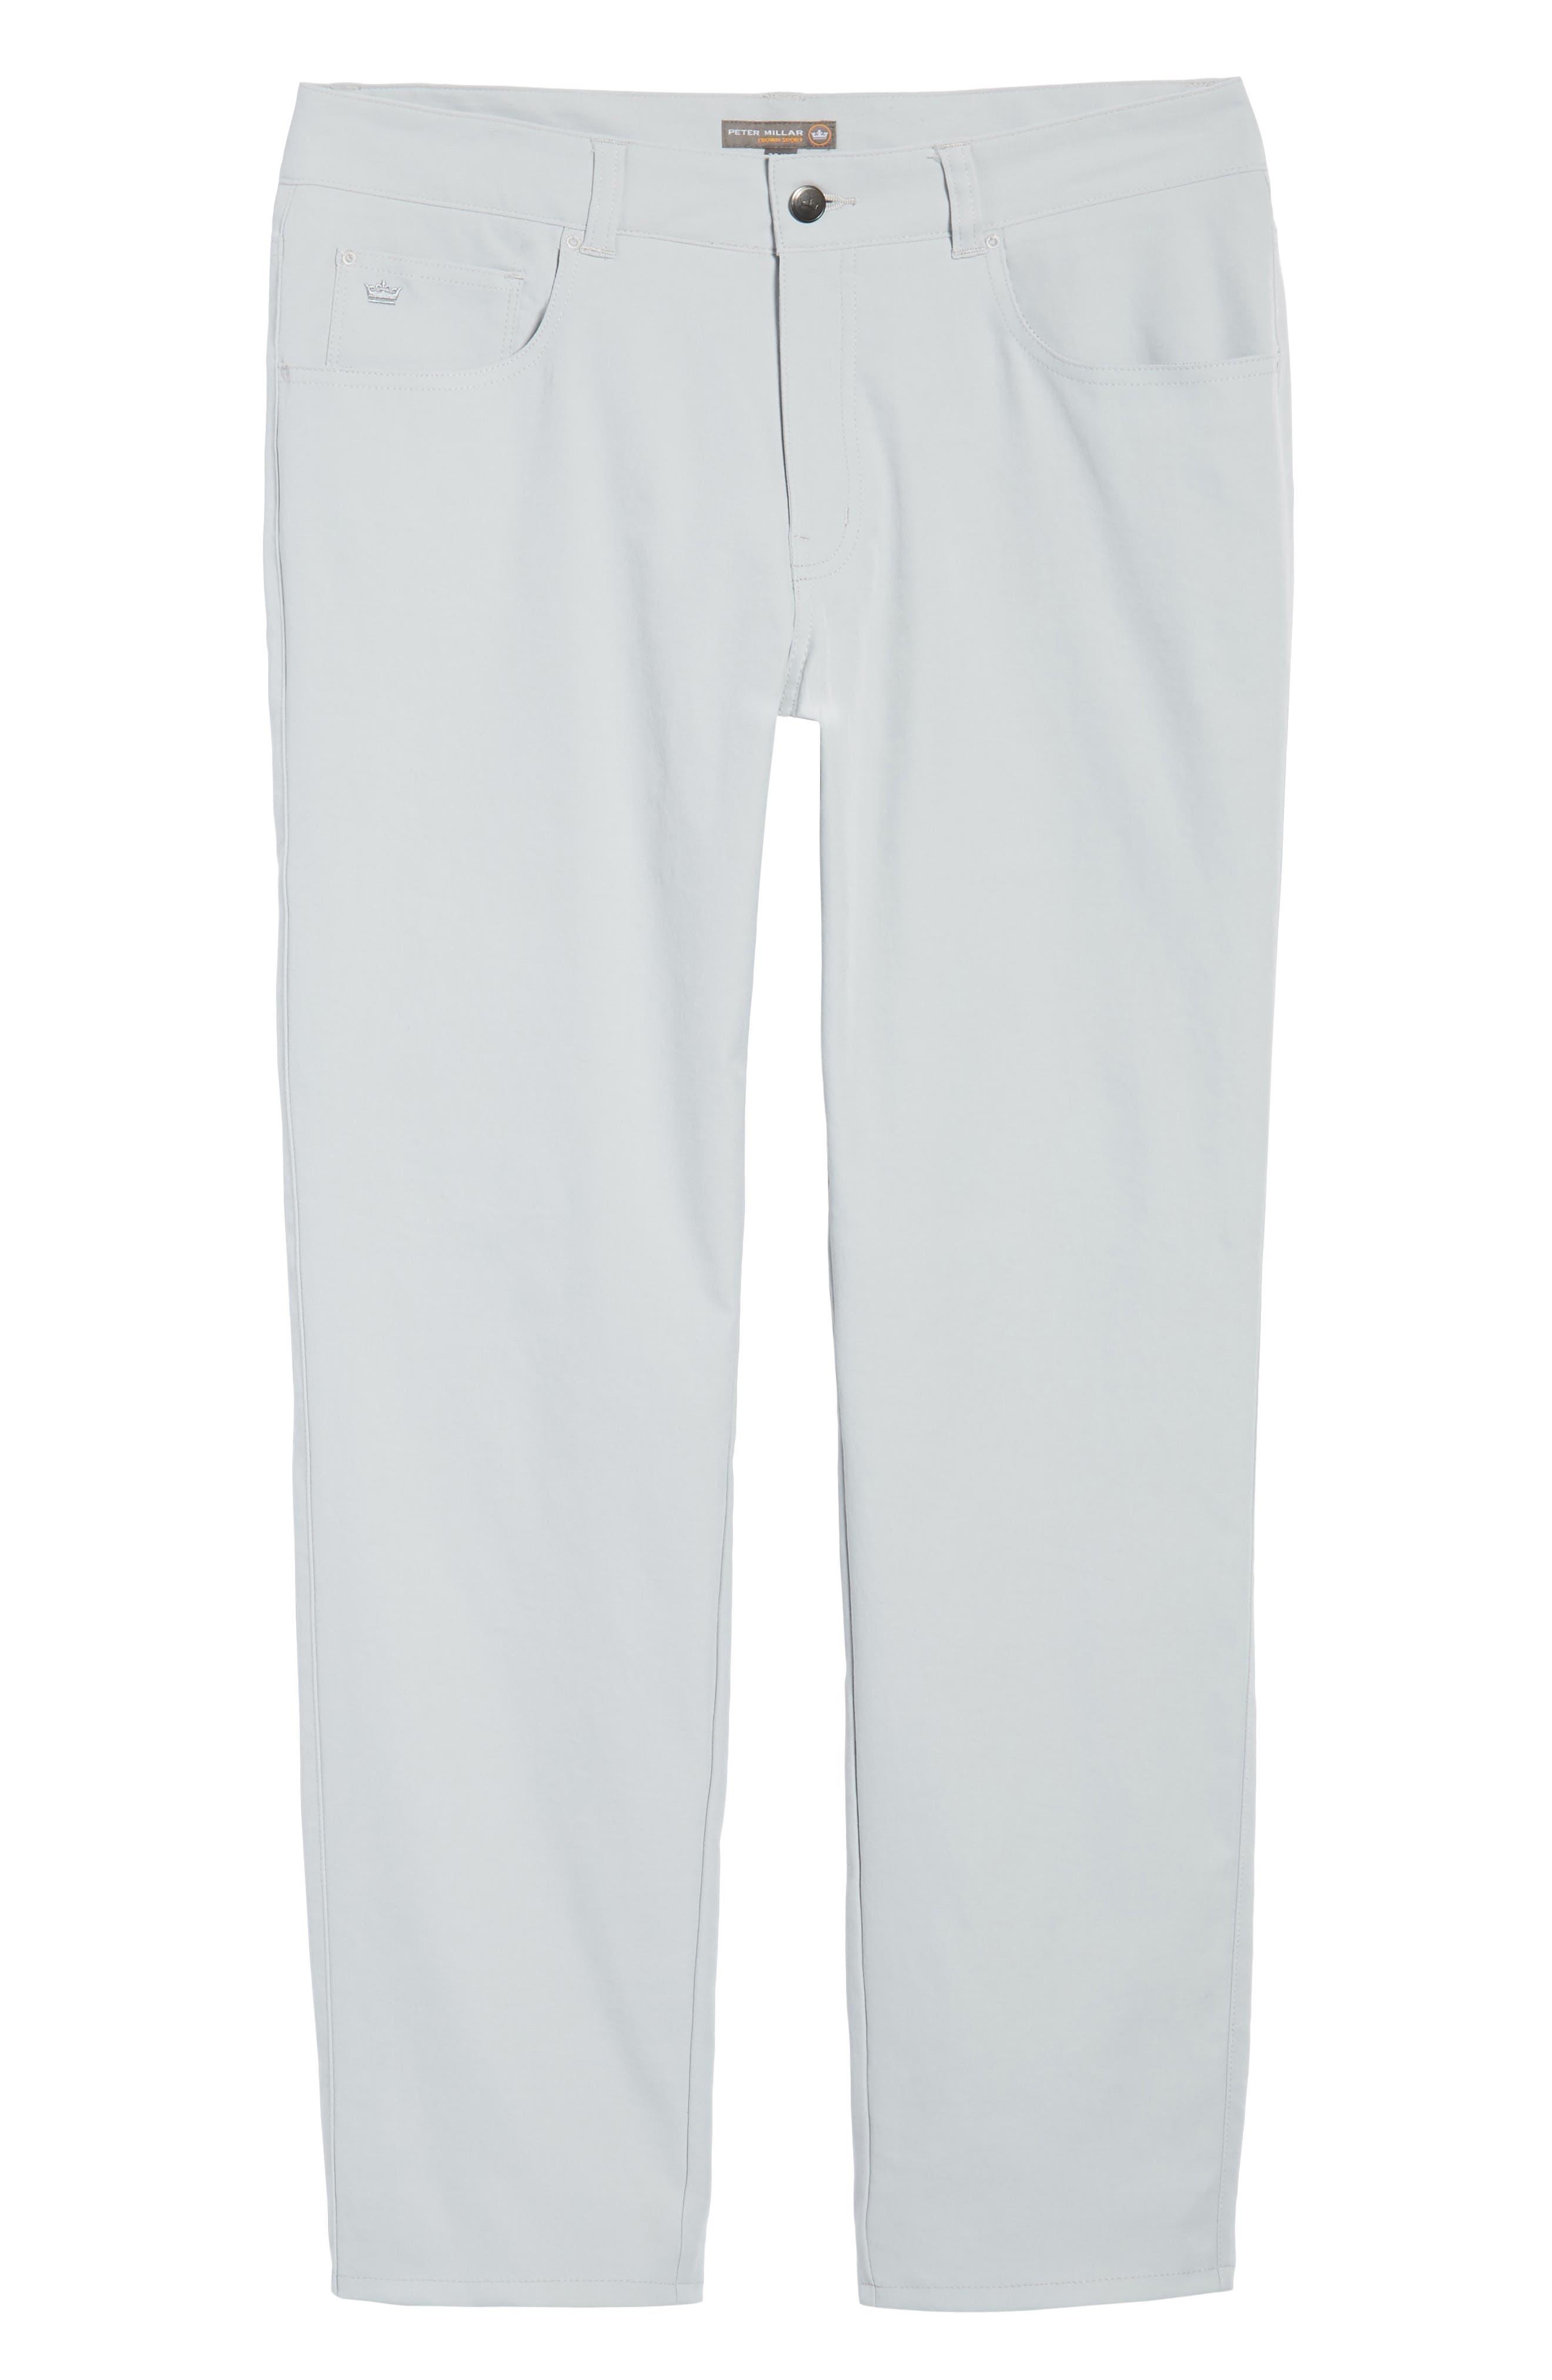 EB66 Performance Six-Pocket Pants,                             Alternate thumbnail 32, color,